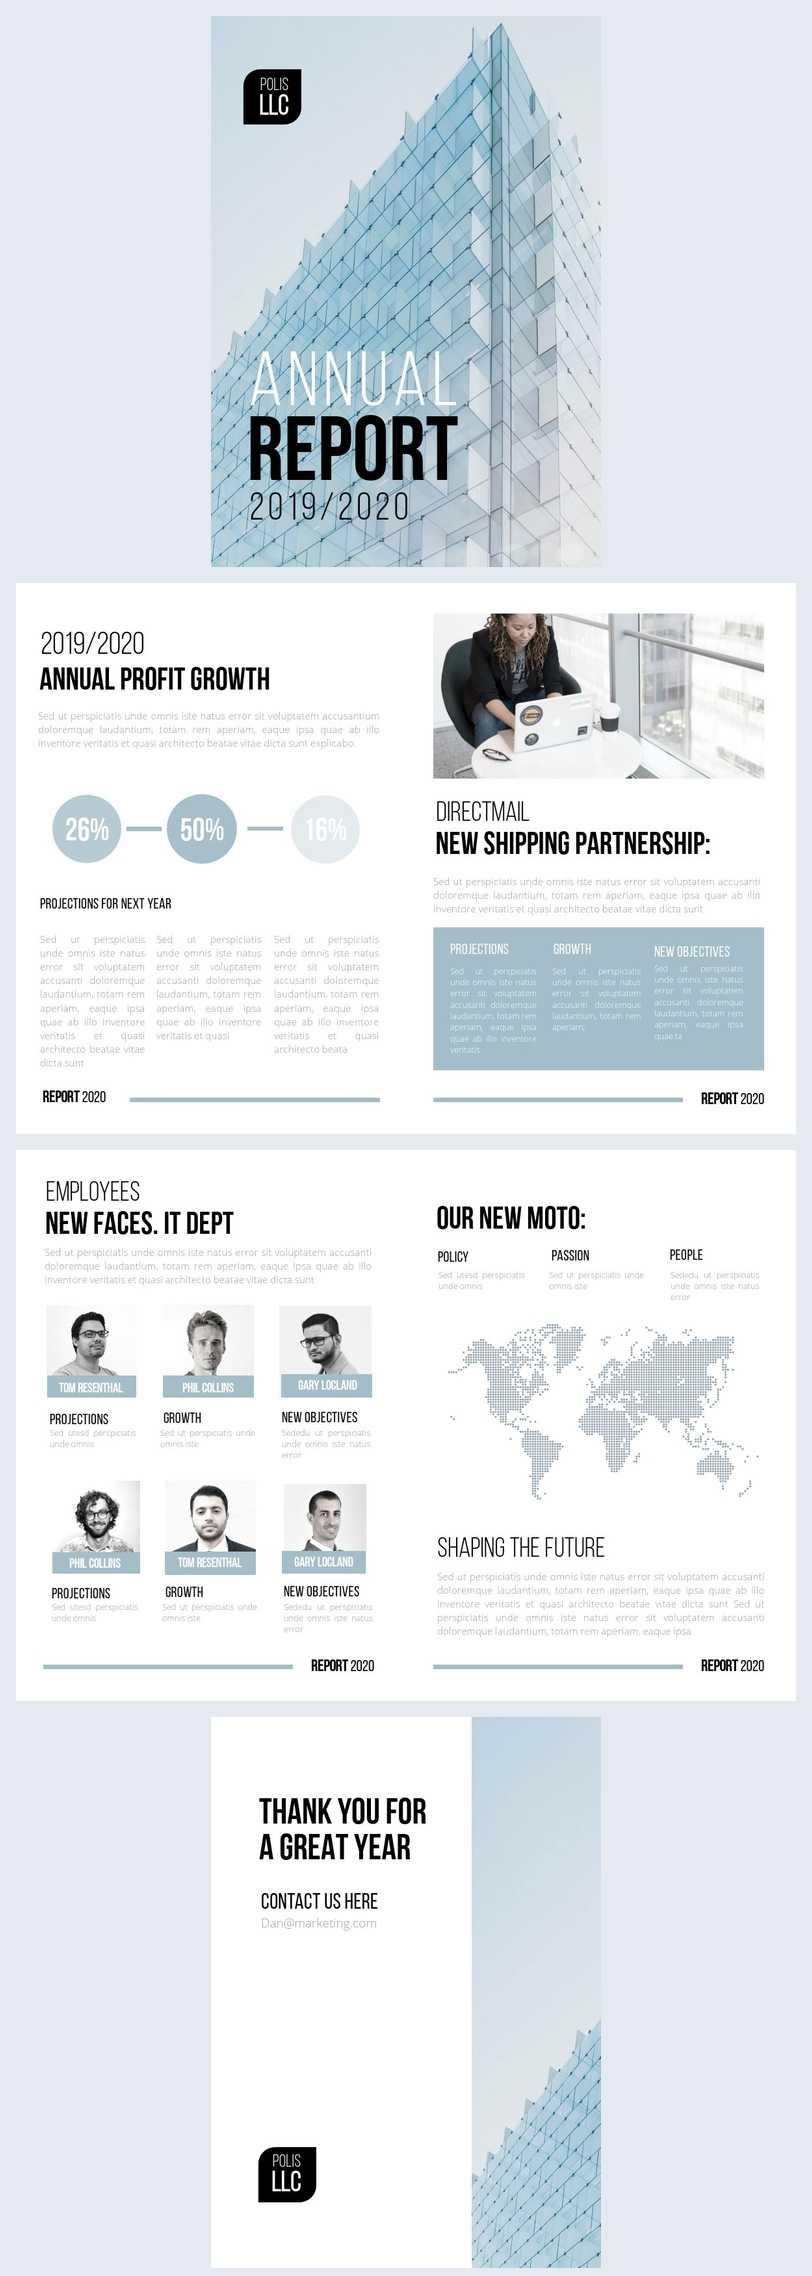 Free Modern Llc Annual Report Template - Flipsnack With Regard To Llc Annual Report Template